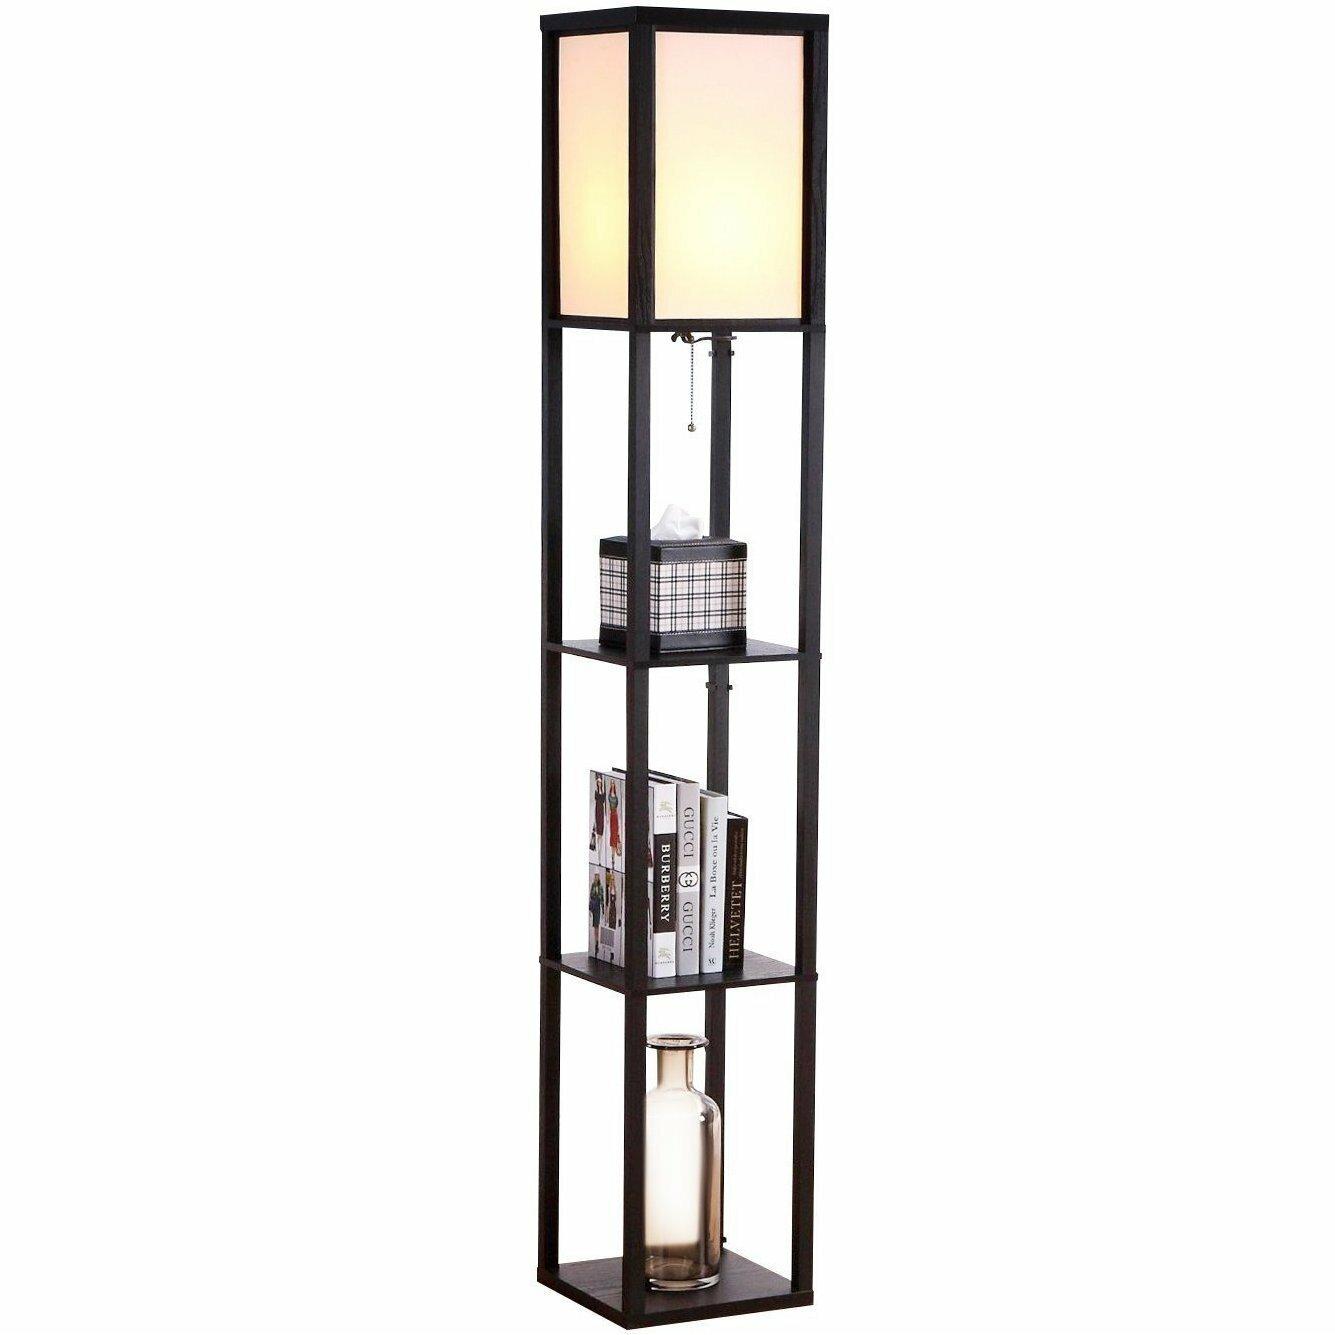 "Floor Lamps For Living Room With Shelves Reading Bedroom: Maxwell Shelf 63"" Floor Lamp"